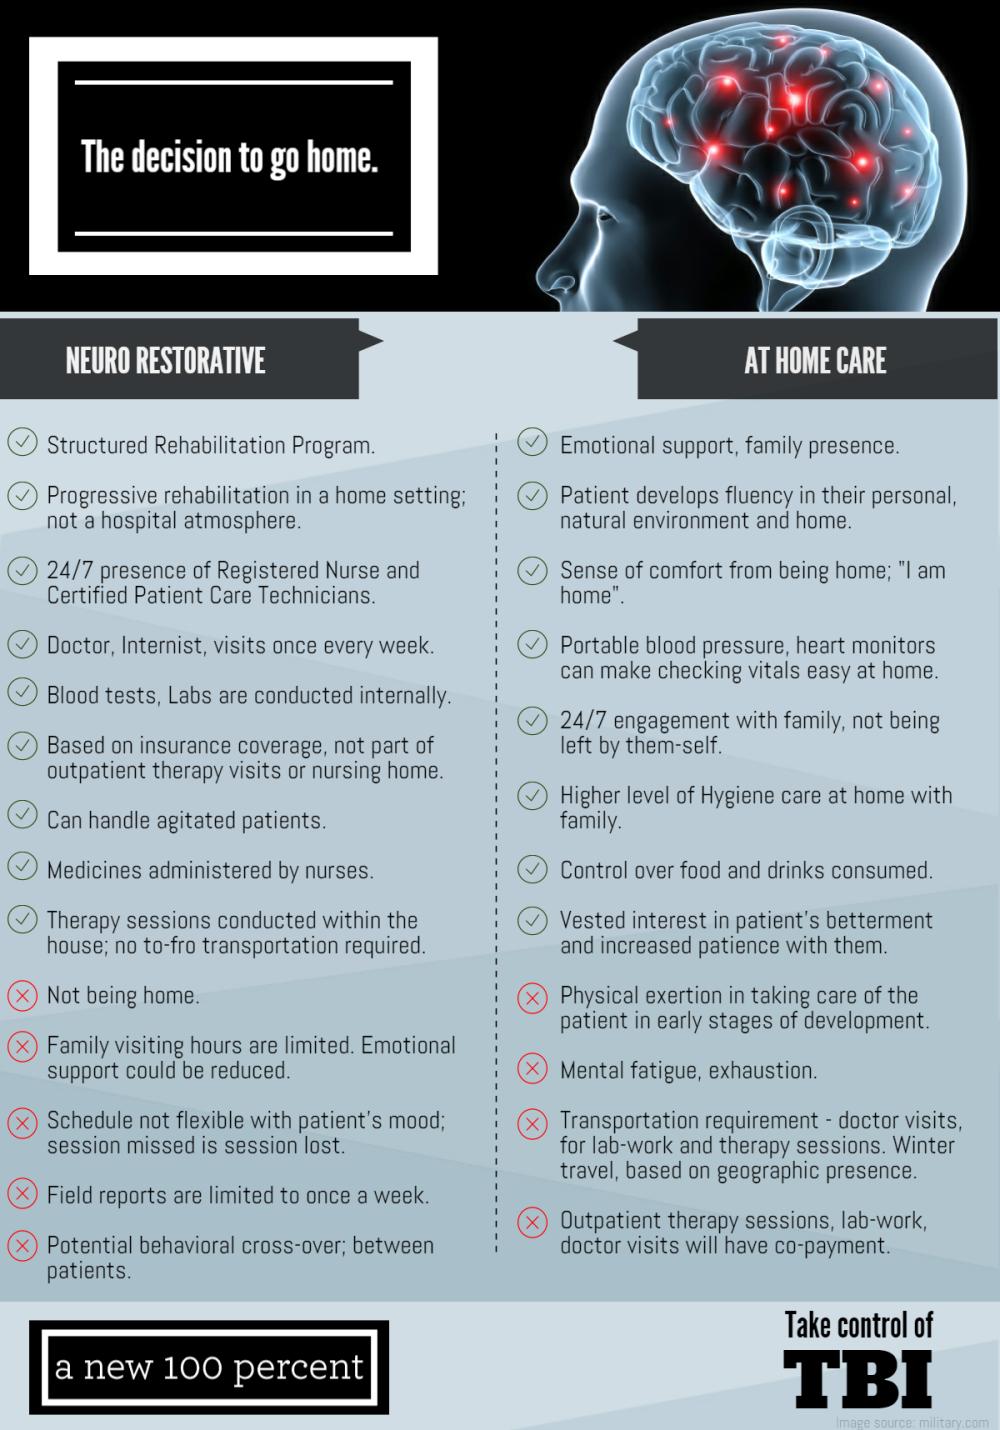 traumatic-brain-injury-neurorestorative-vs-outpatient